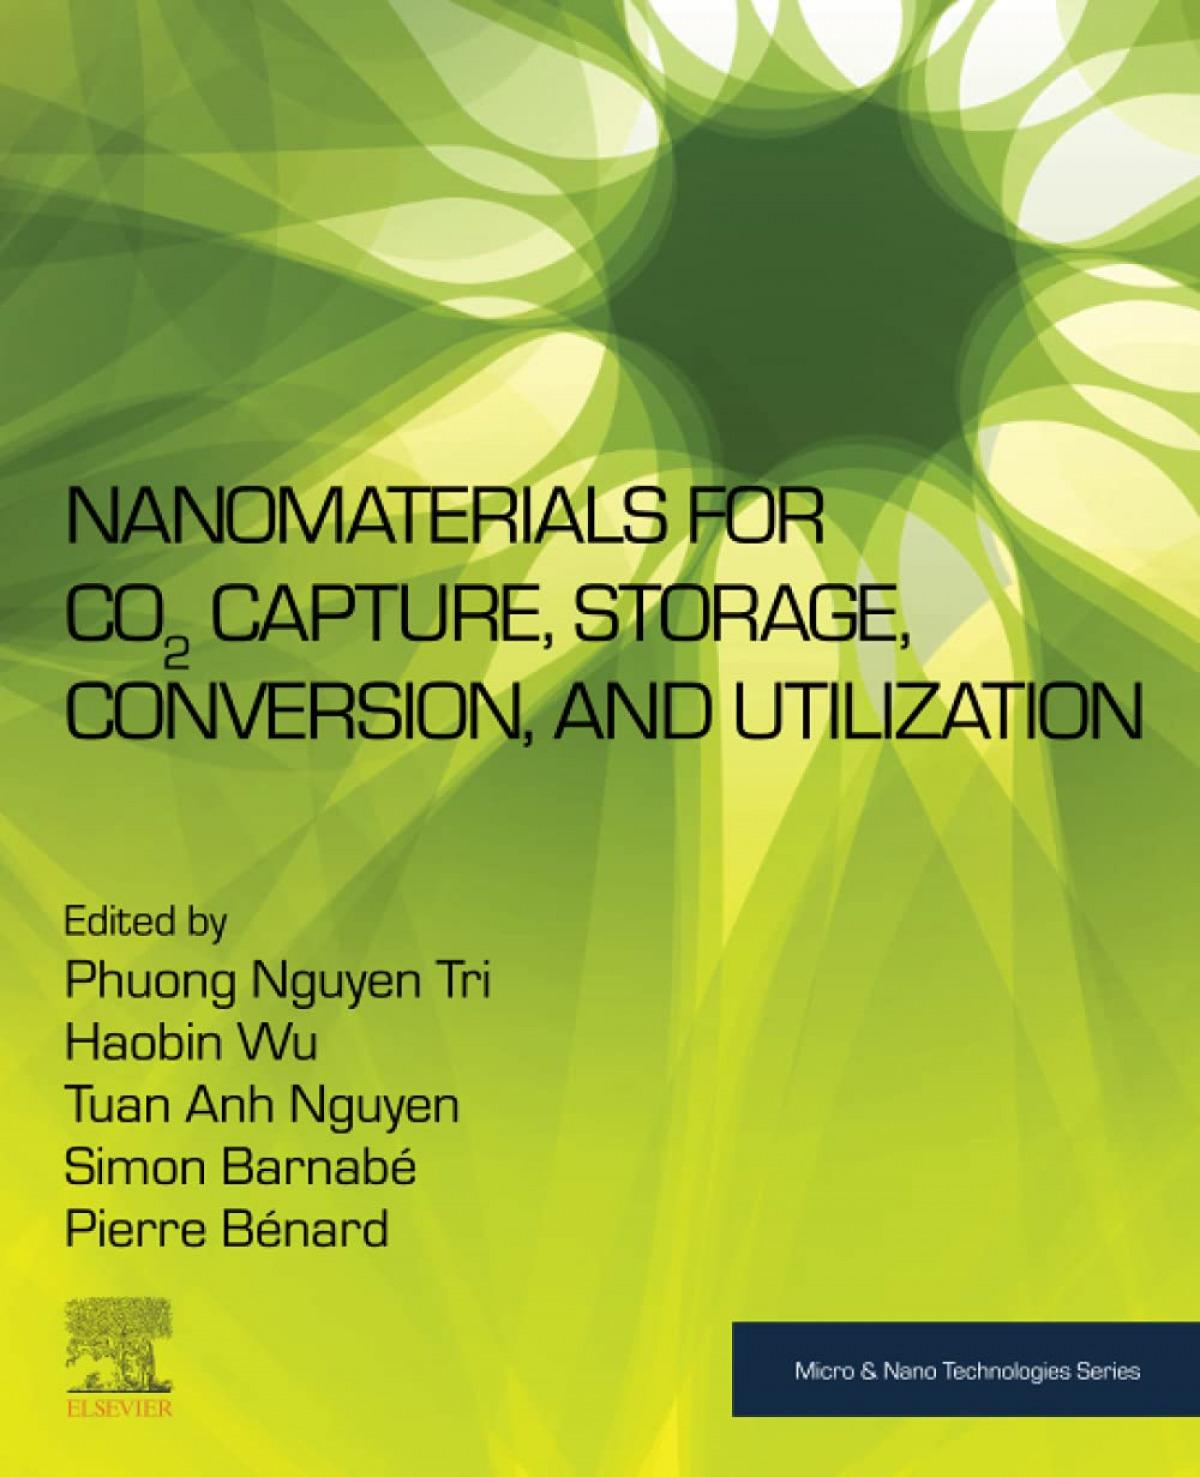 NANOMATERIALS FOR CO2 CAPTURE,STORAGE,CONVERSION UTILIZATIO